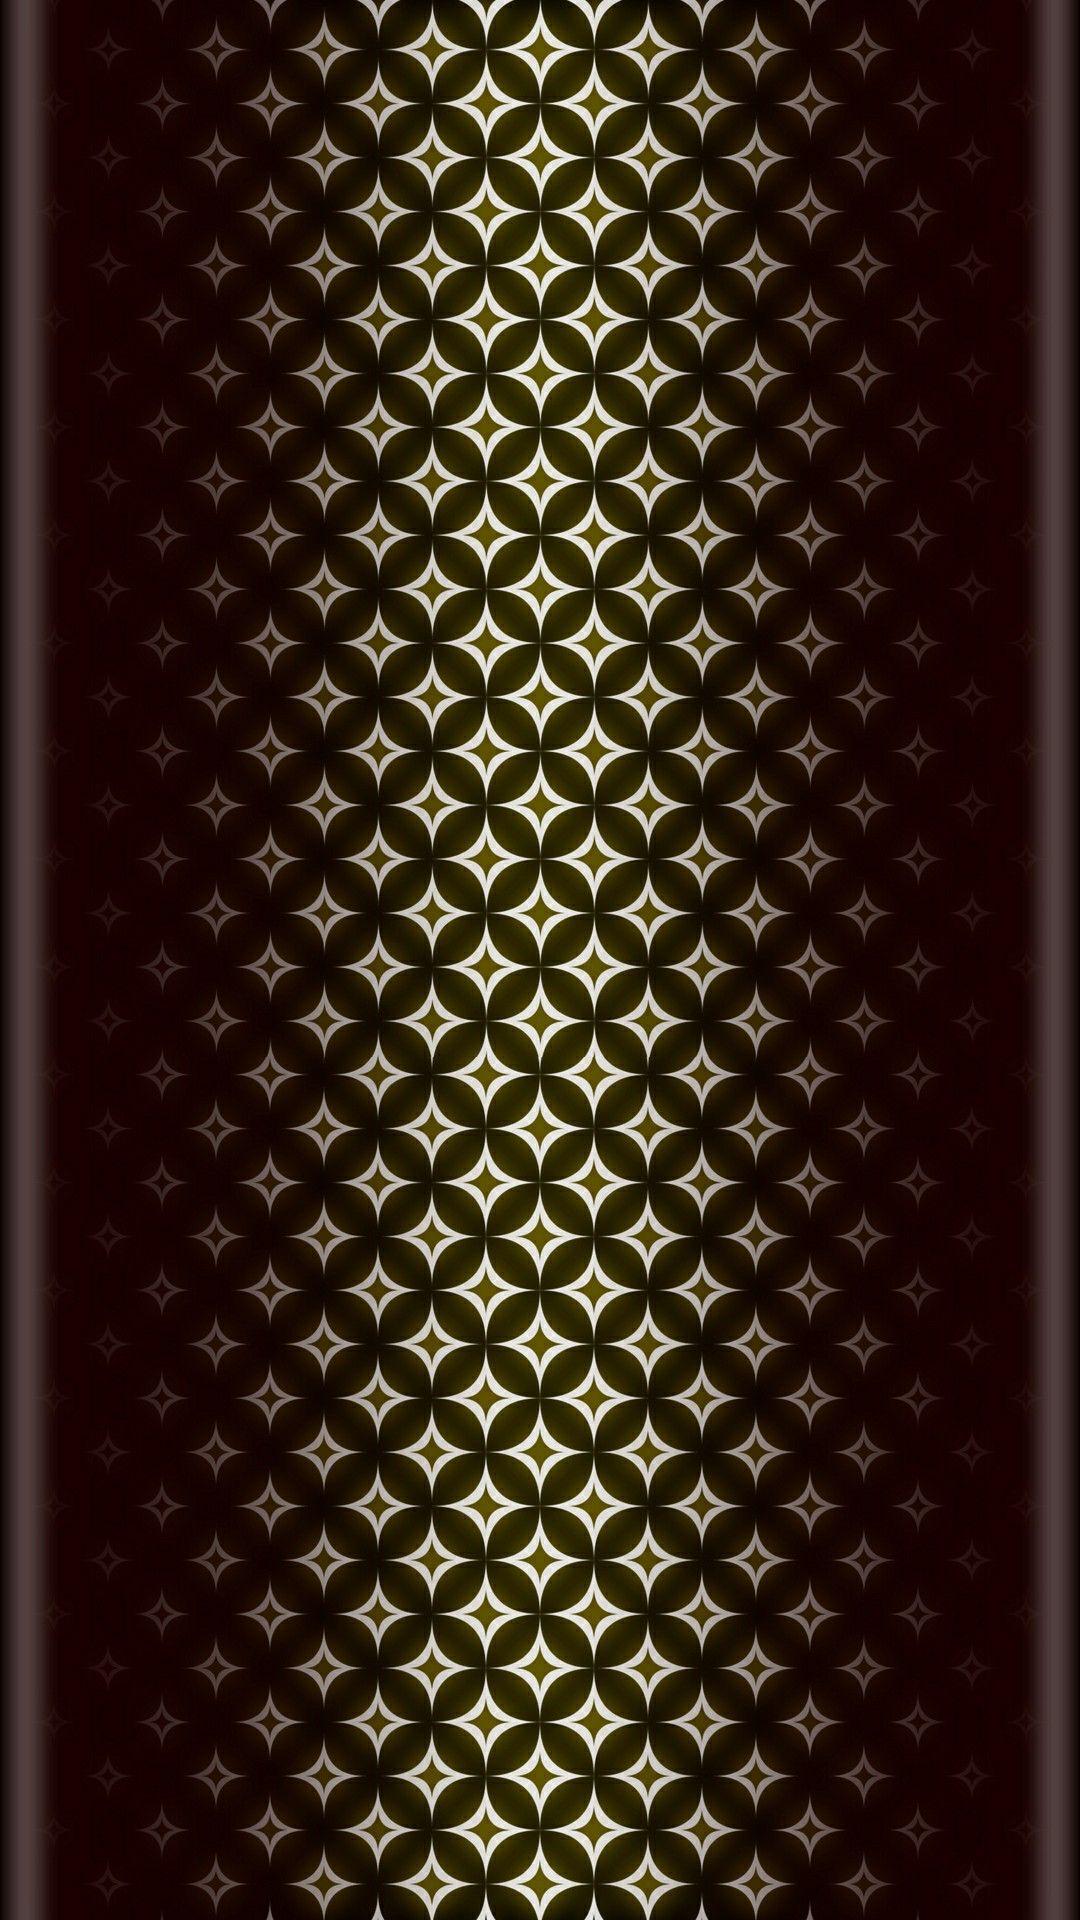 Beautiful I Love It Abstract Iphone Wallpaper Phone Screen